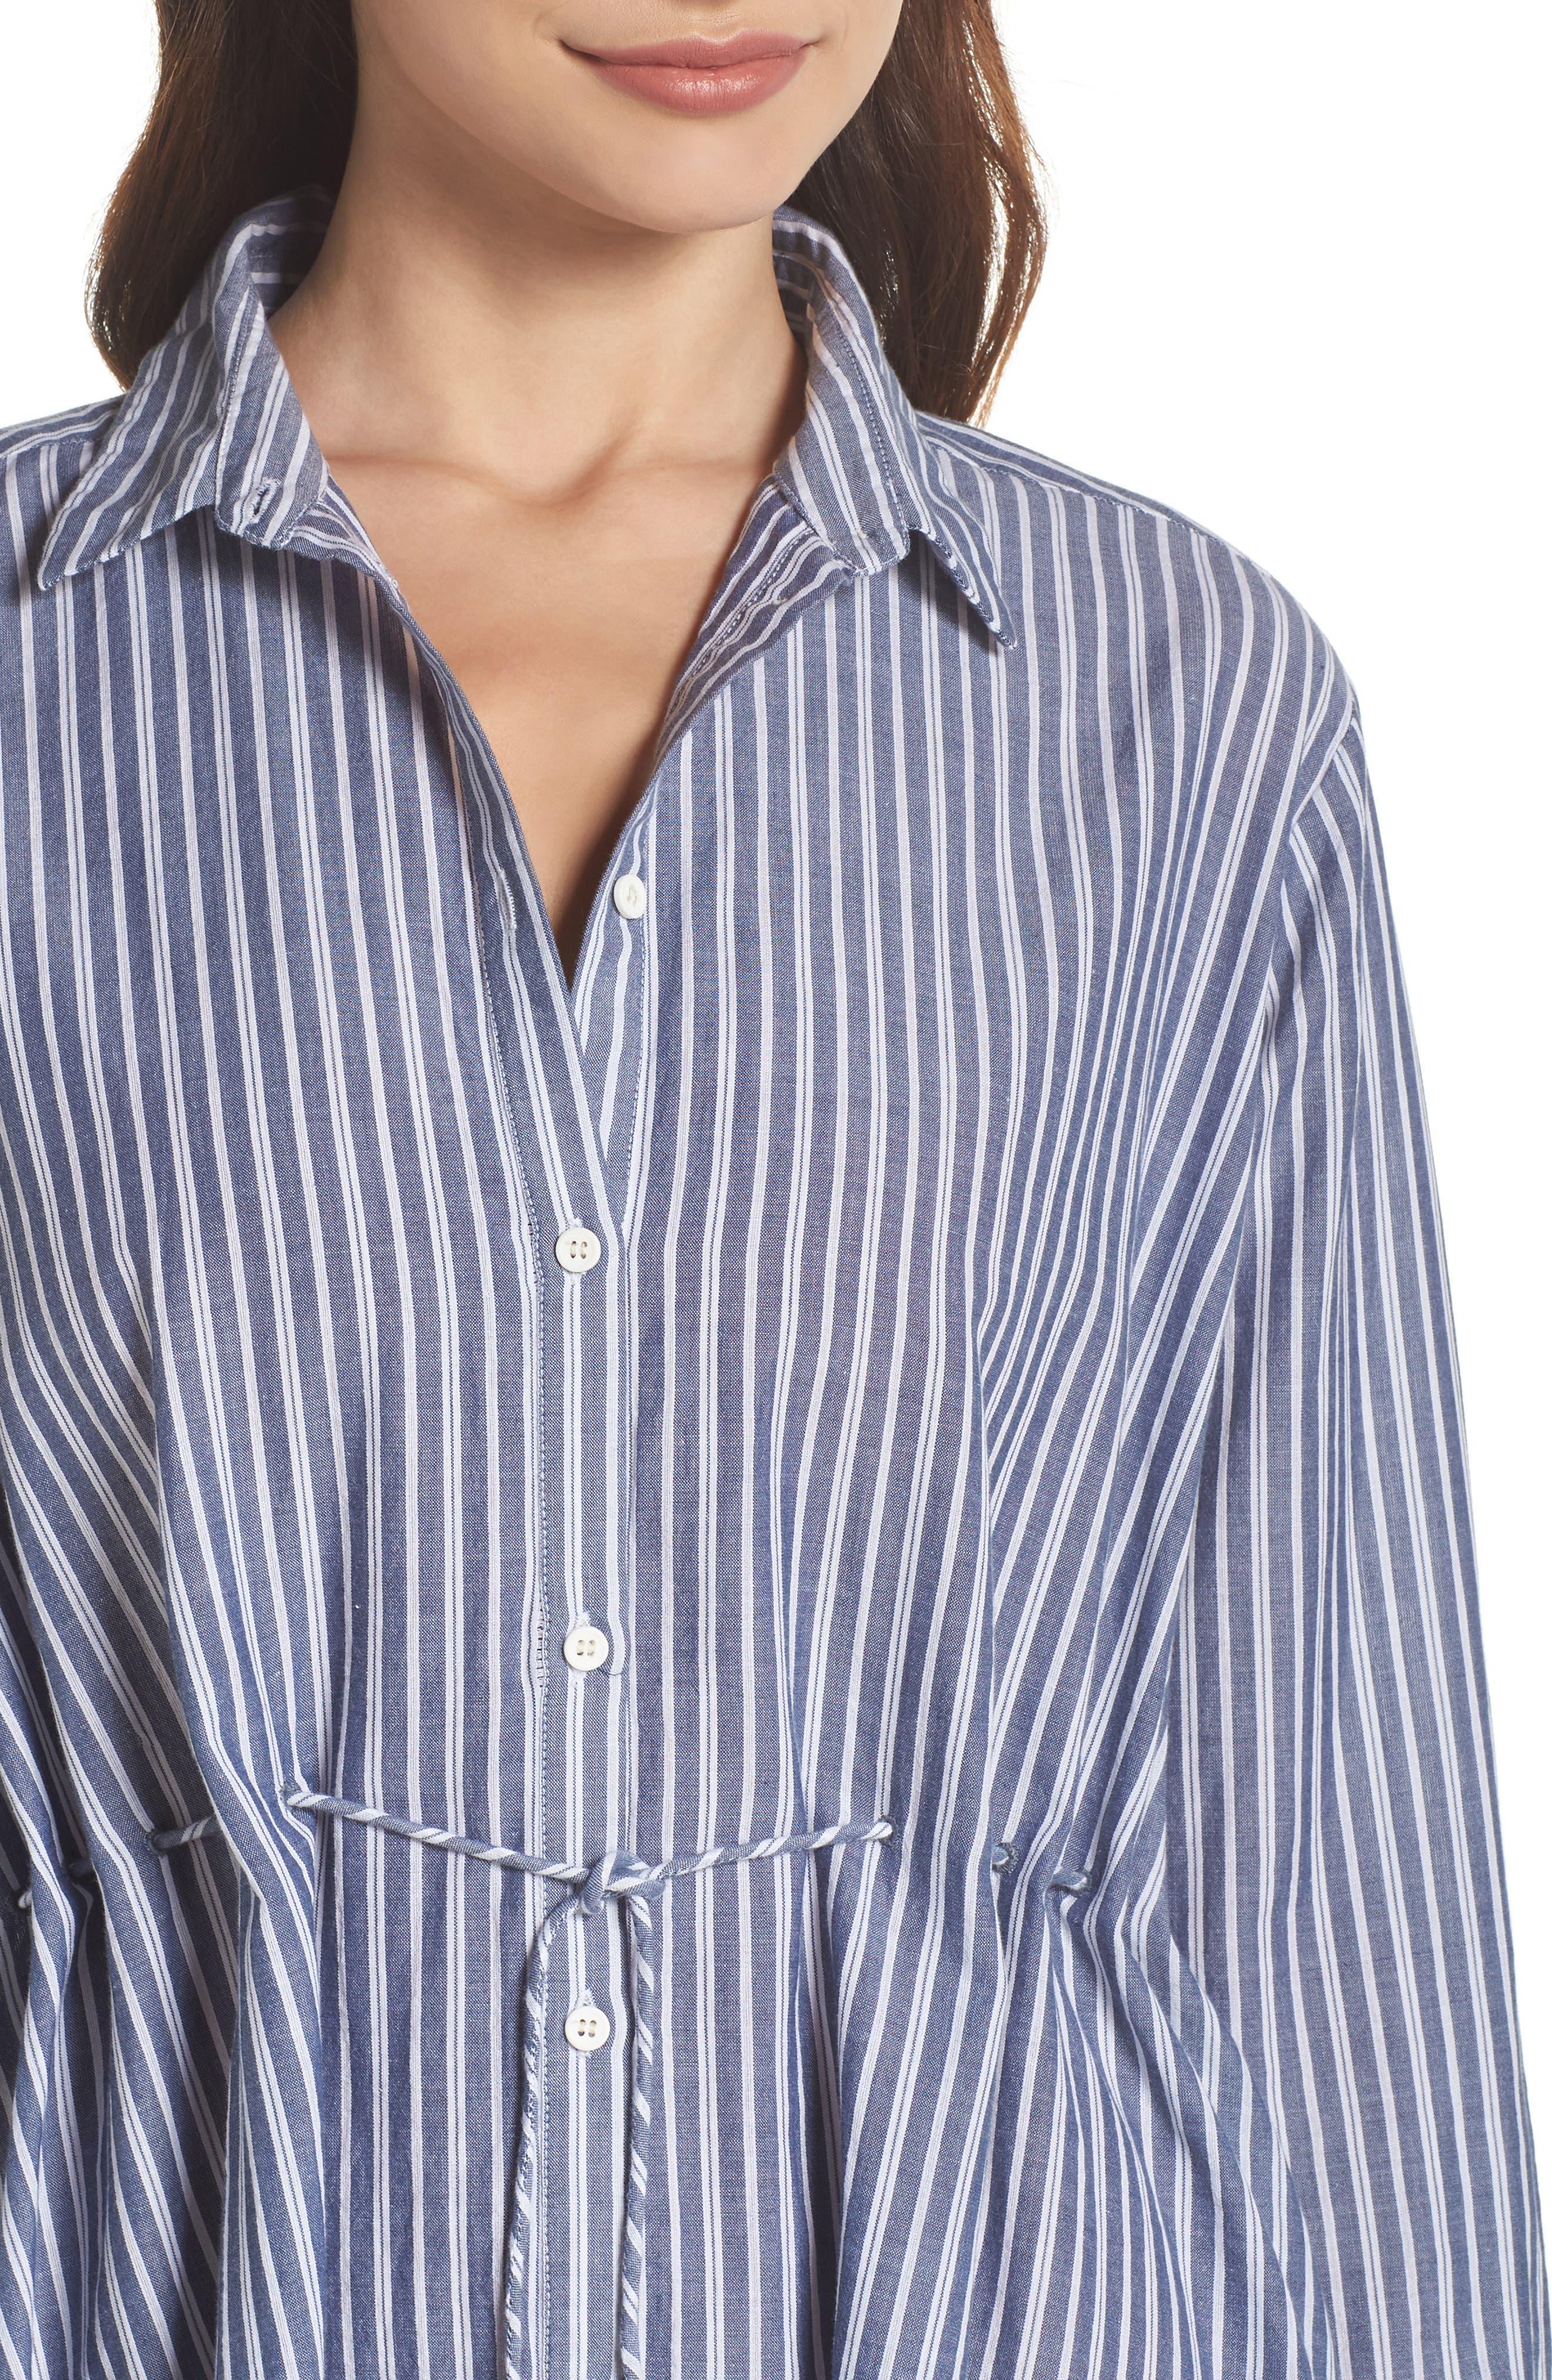 Tatus Stripe Drawstring Cotton Shirtdress,                             Alternate thumbnail 4, color,                             452